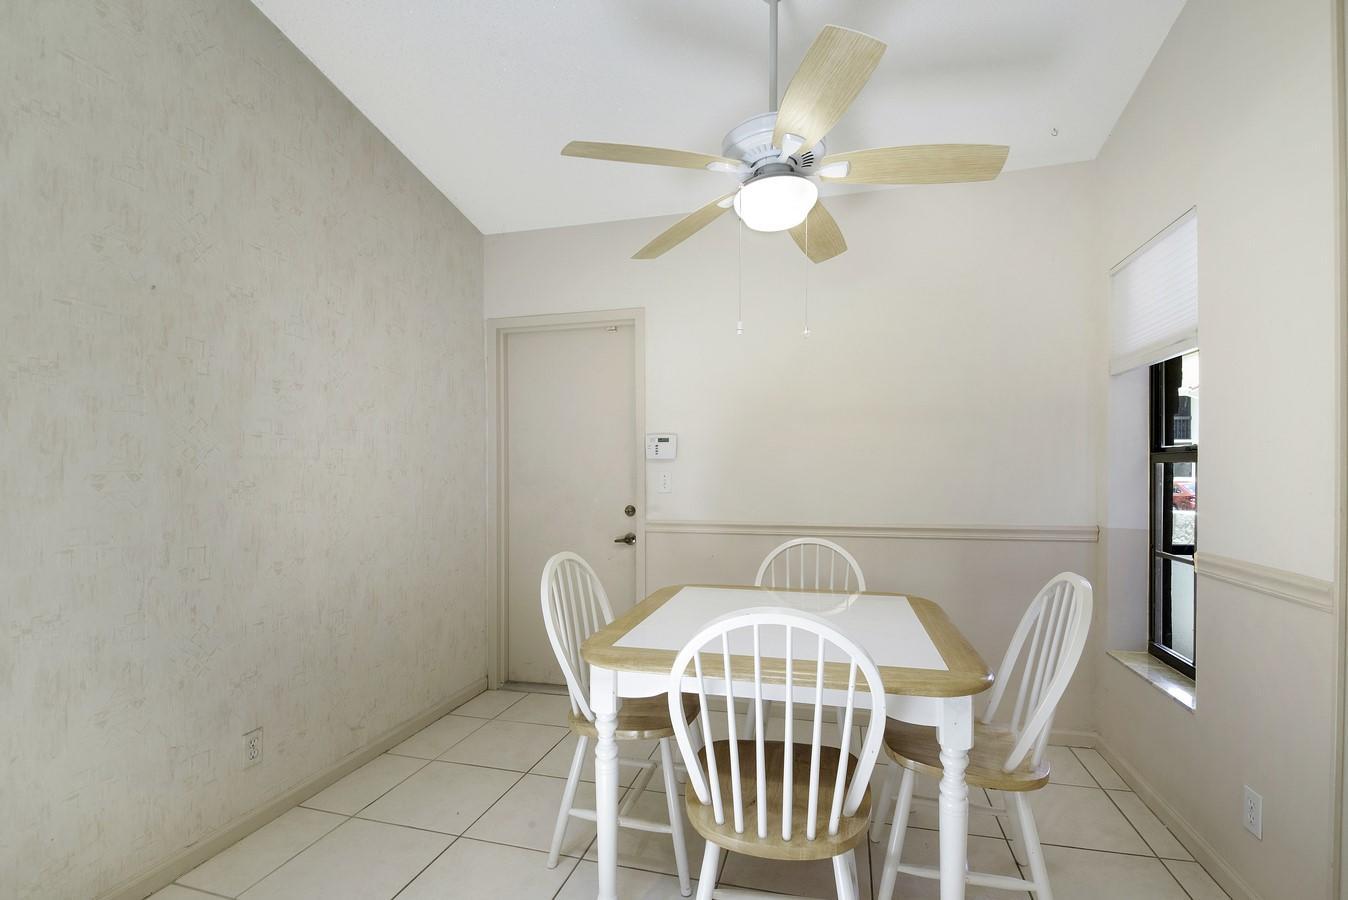 9747 Pavarotti Terrace 103 Boynton Beach, FL 33437 photo 14